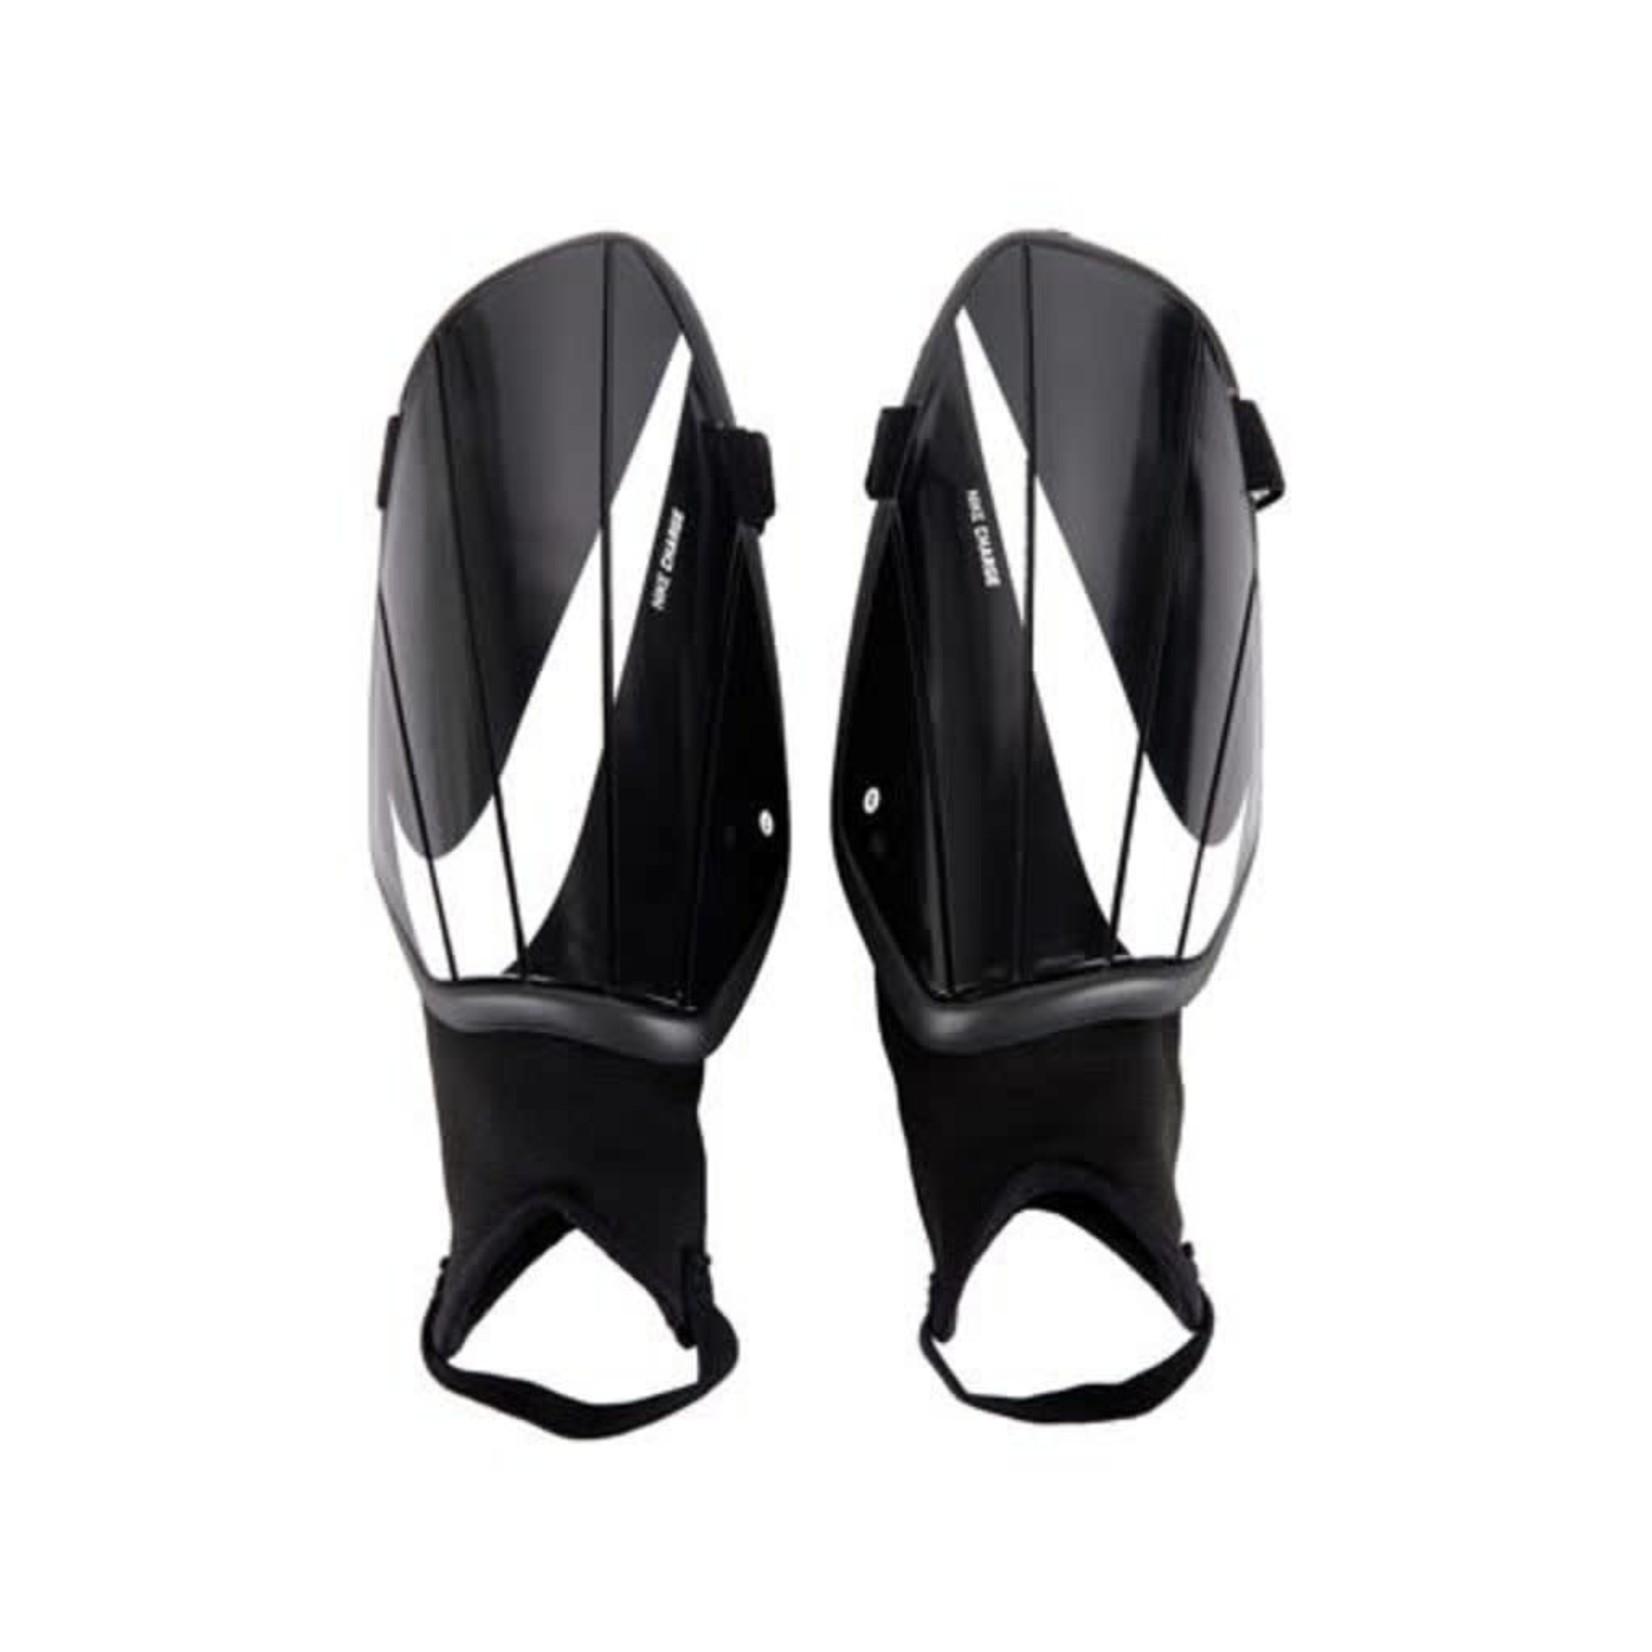 Nike Nike Soccer Shin Pads, Charge, Adult